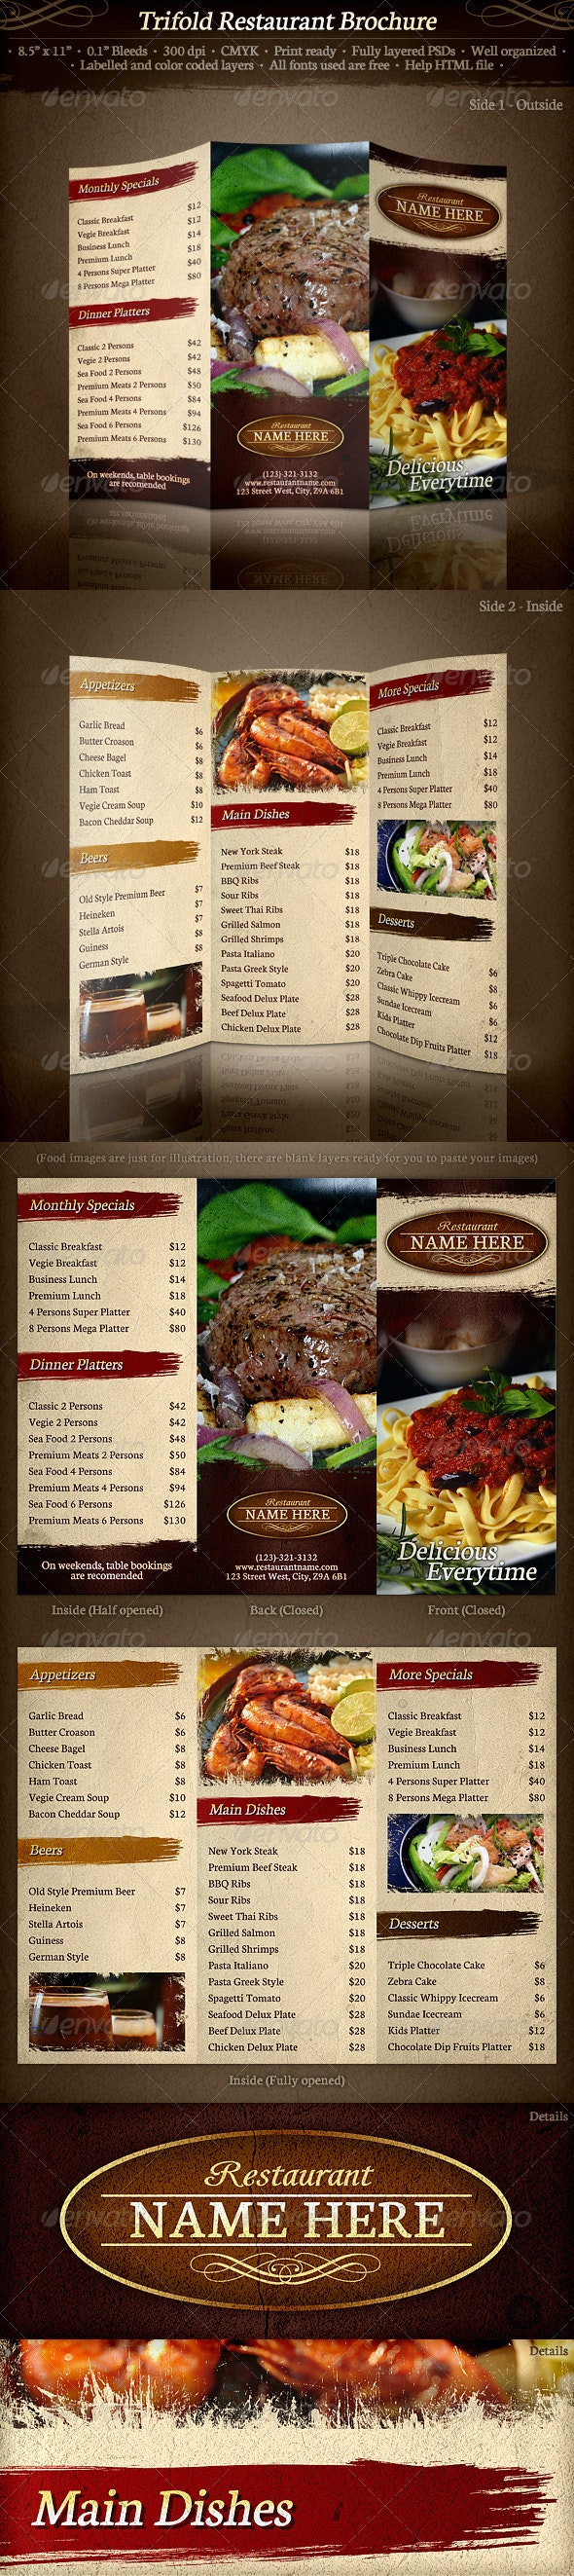 TriFold Restaurant Brochure Template - Food Menus Print Templates